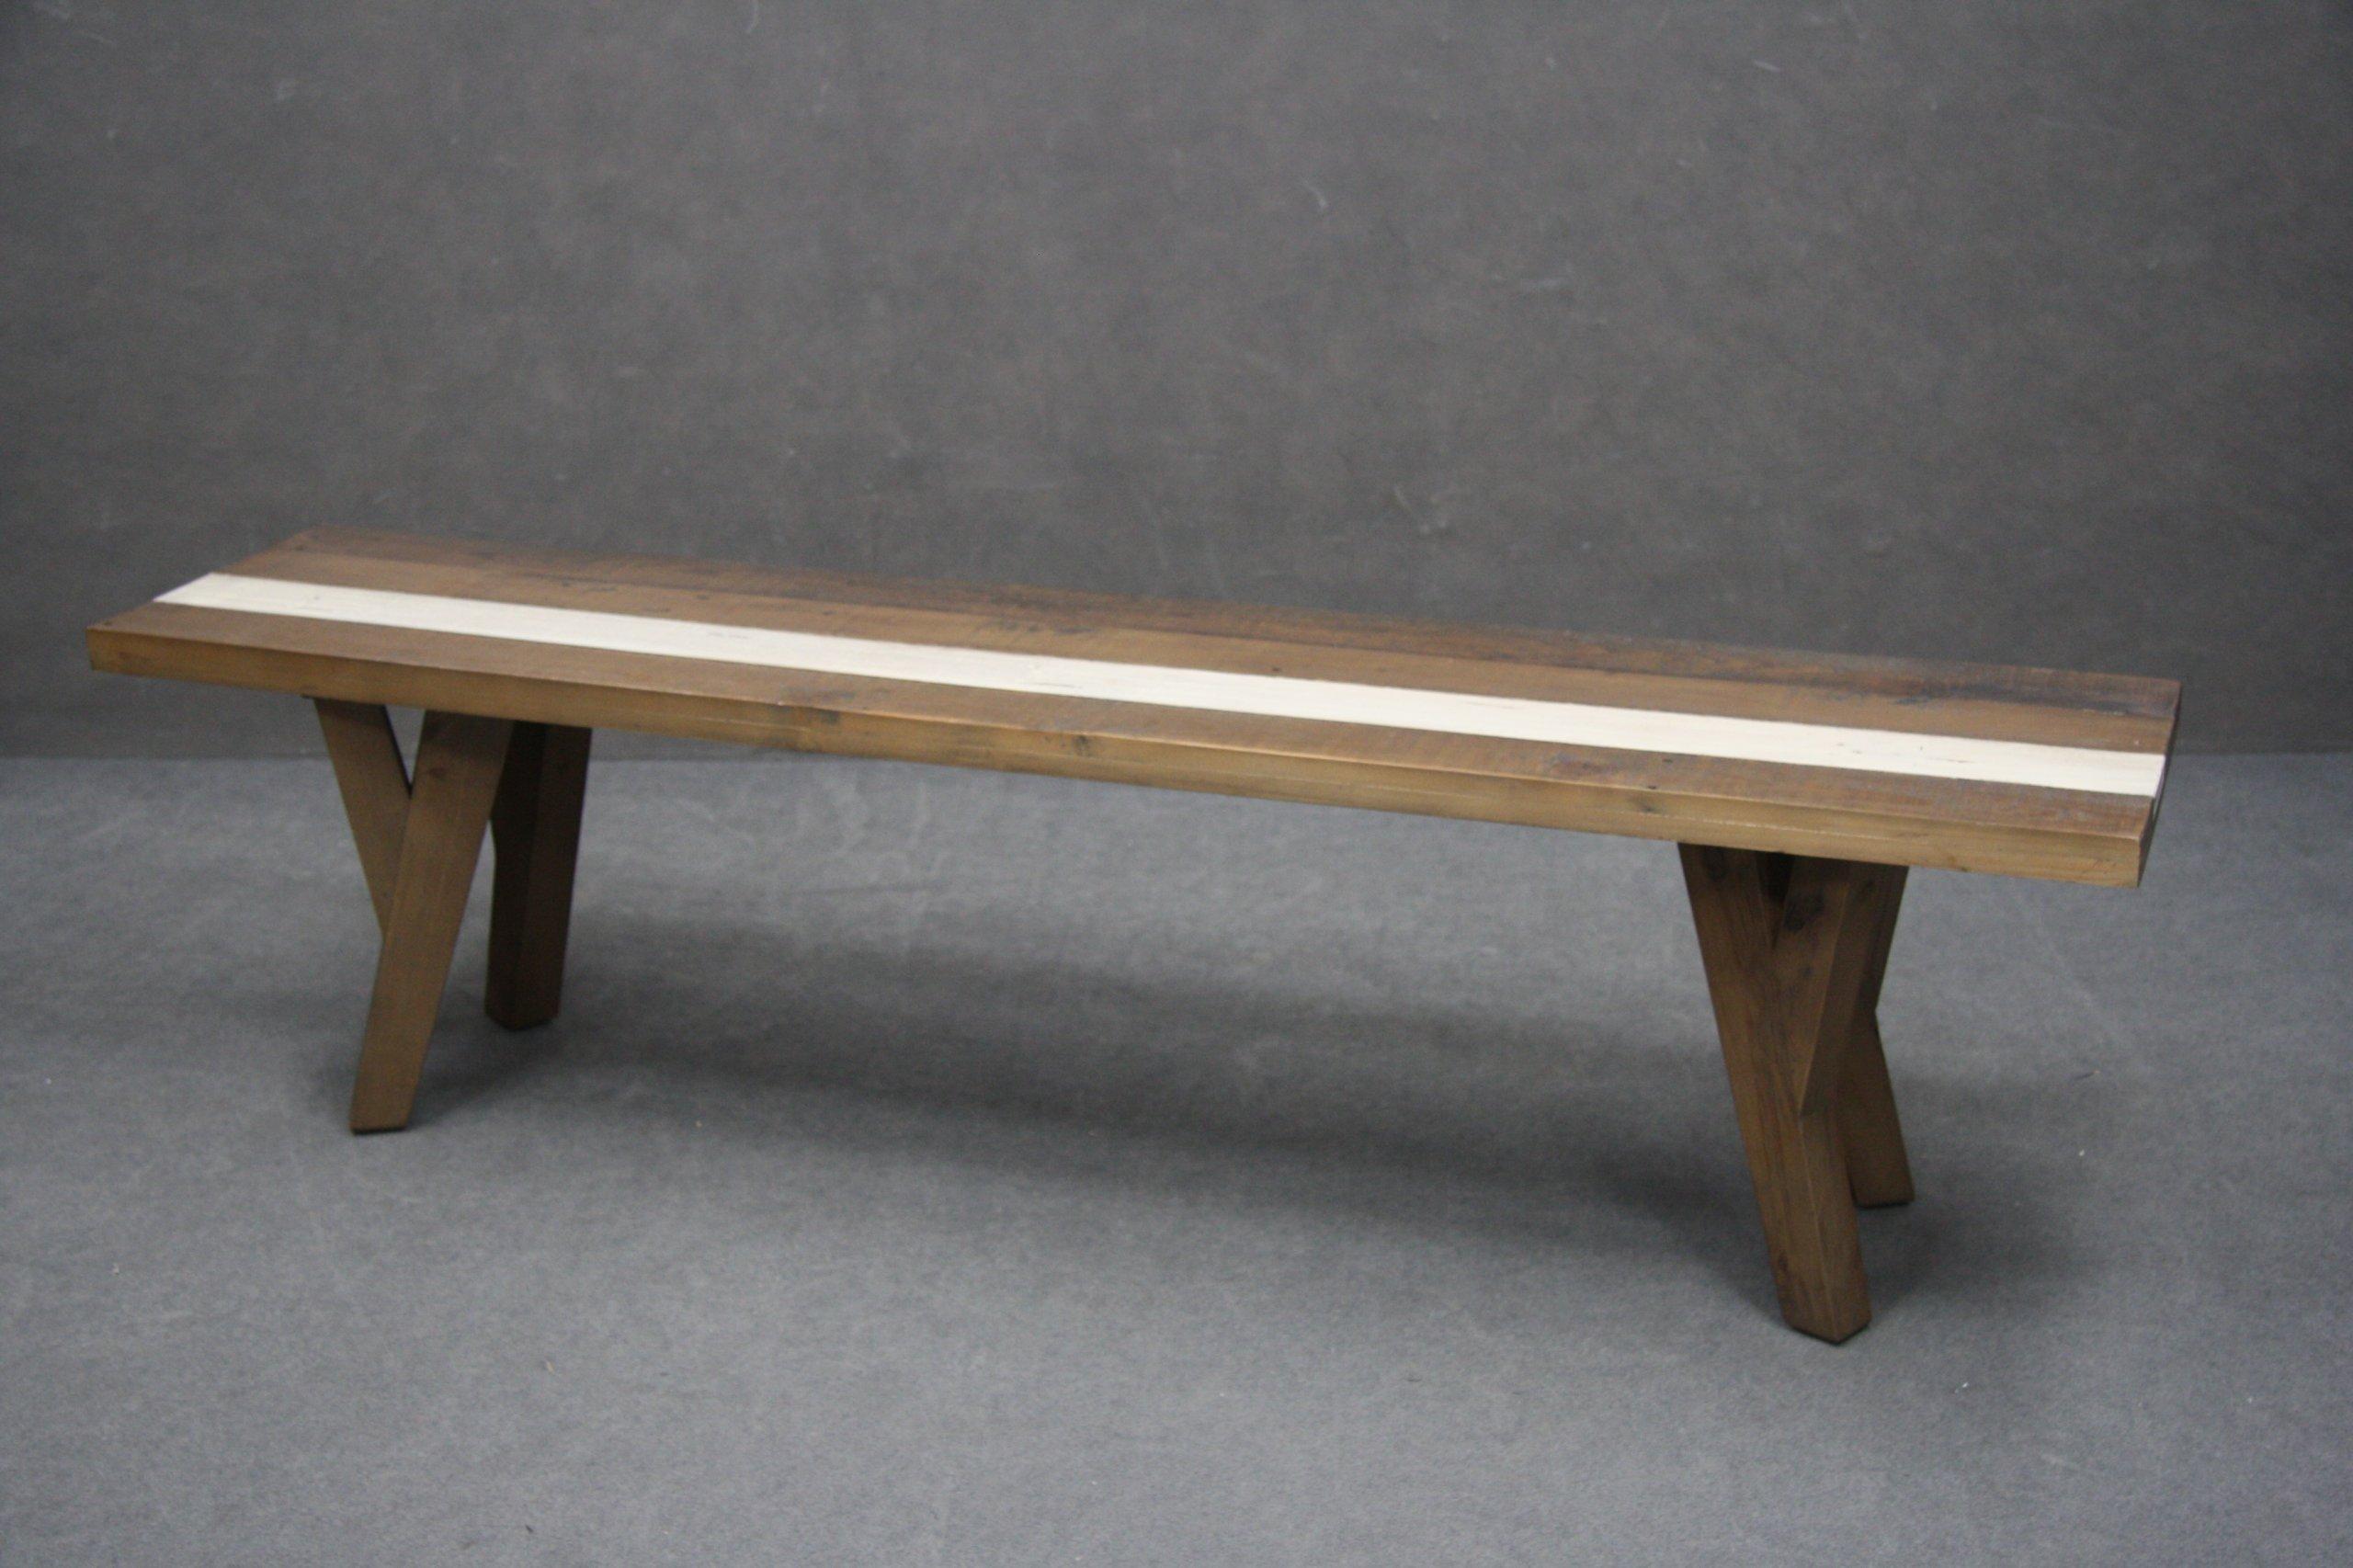 Drevené lavice 170 cm Starej Borovice VINTAGE ORLEANS